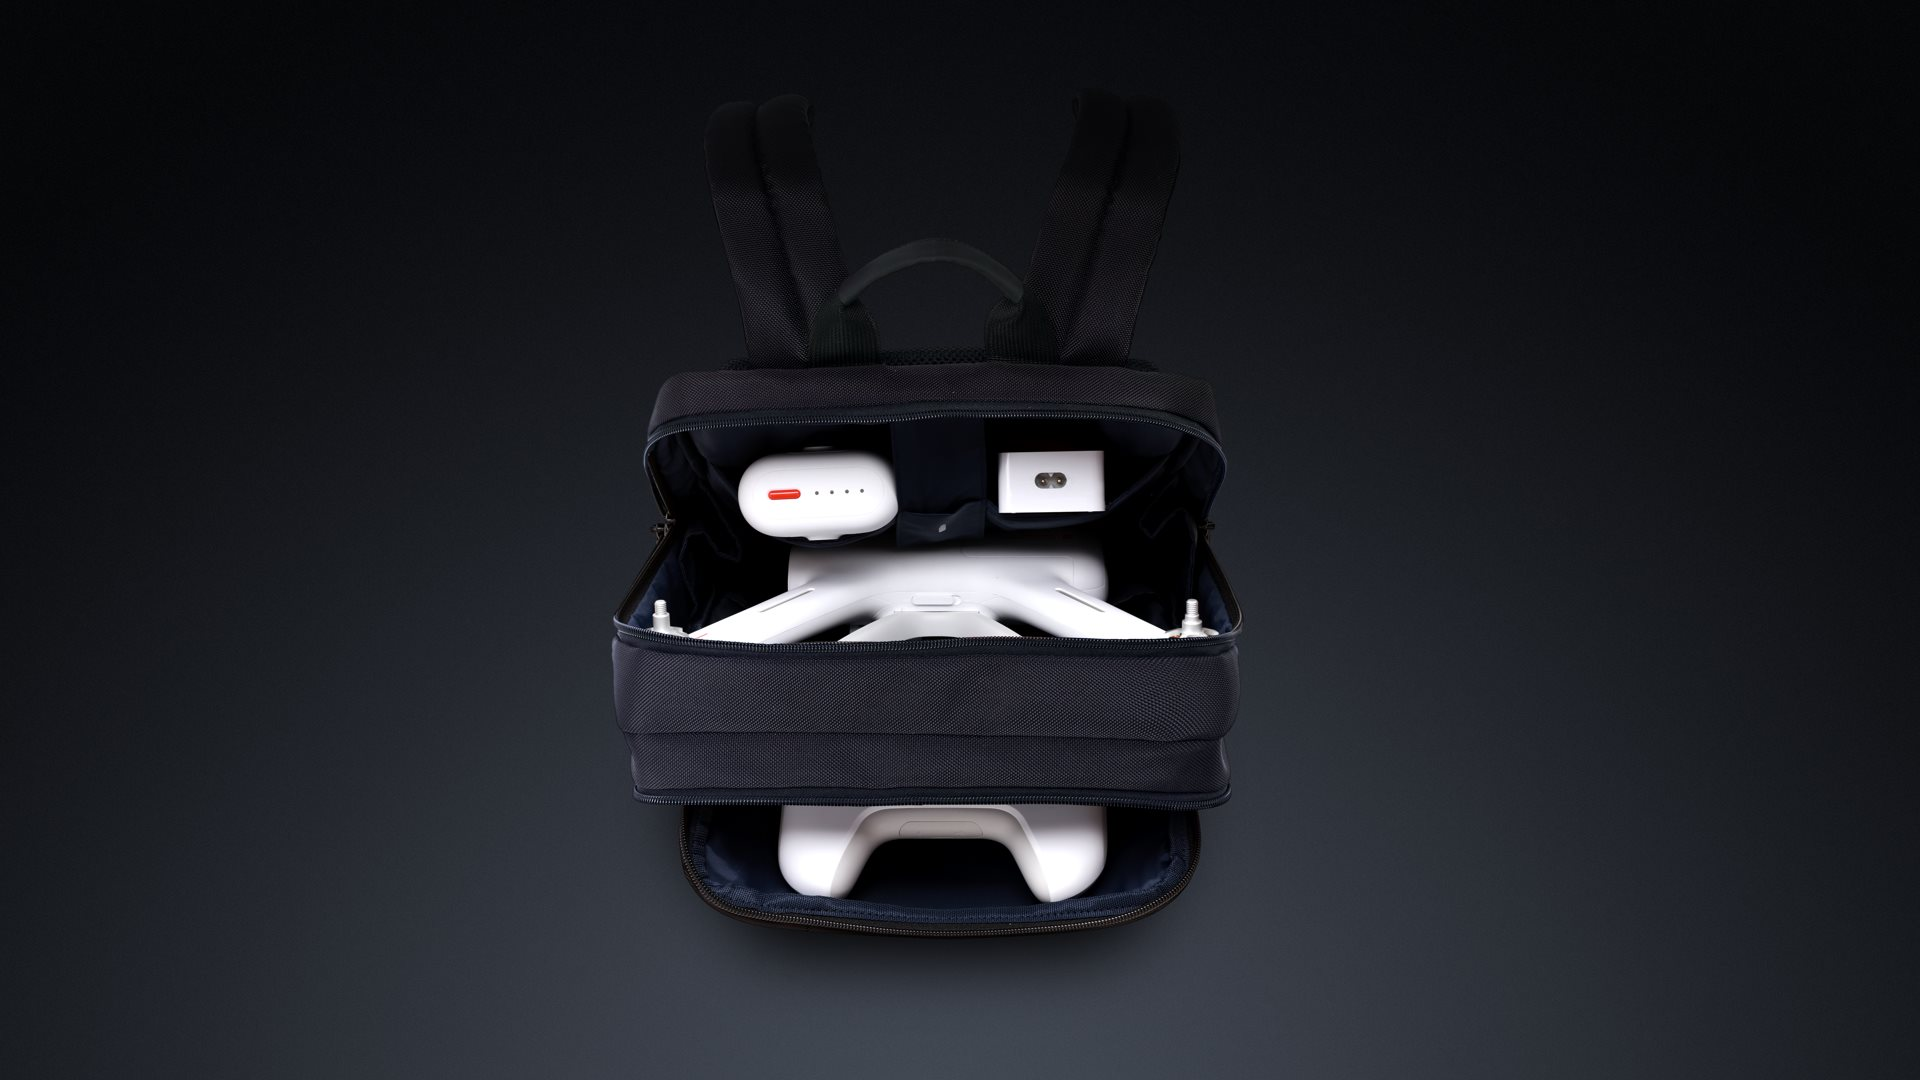 xiaomi mi drone 5 metropolitanmonkey.com